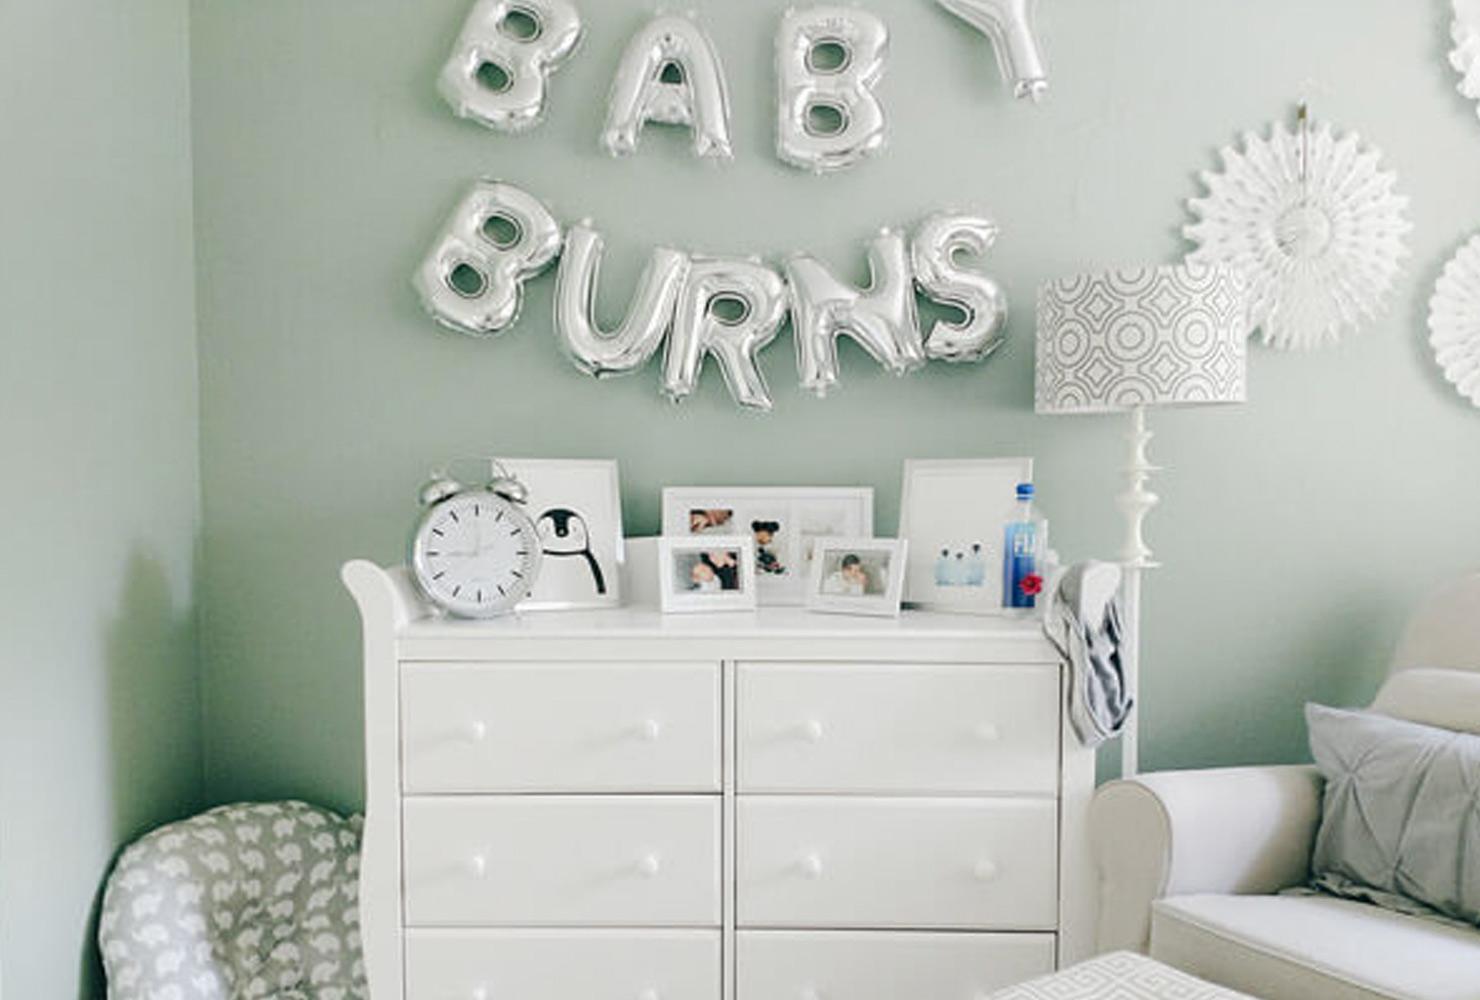 Dekorasi Kamar Bayi Balon pada Dinding